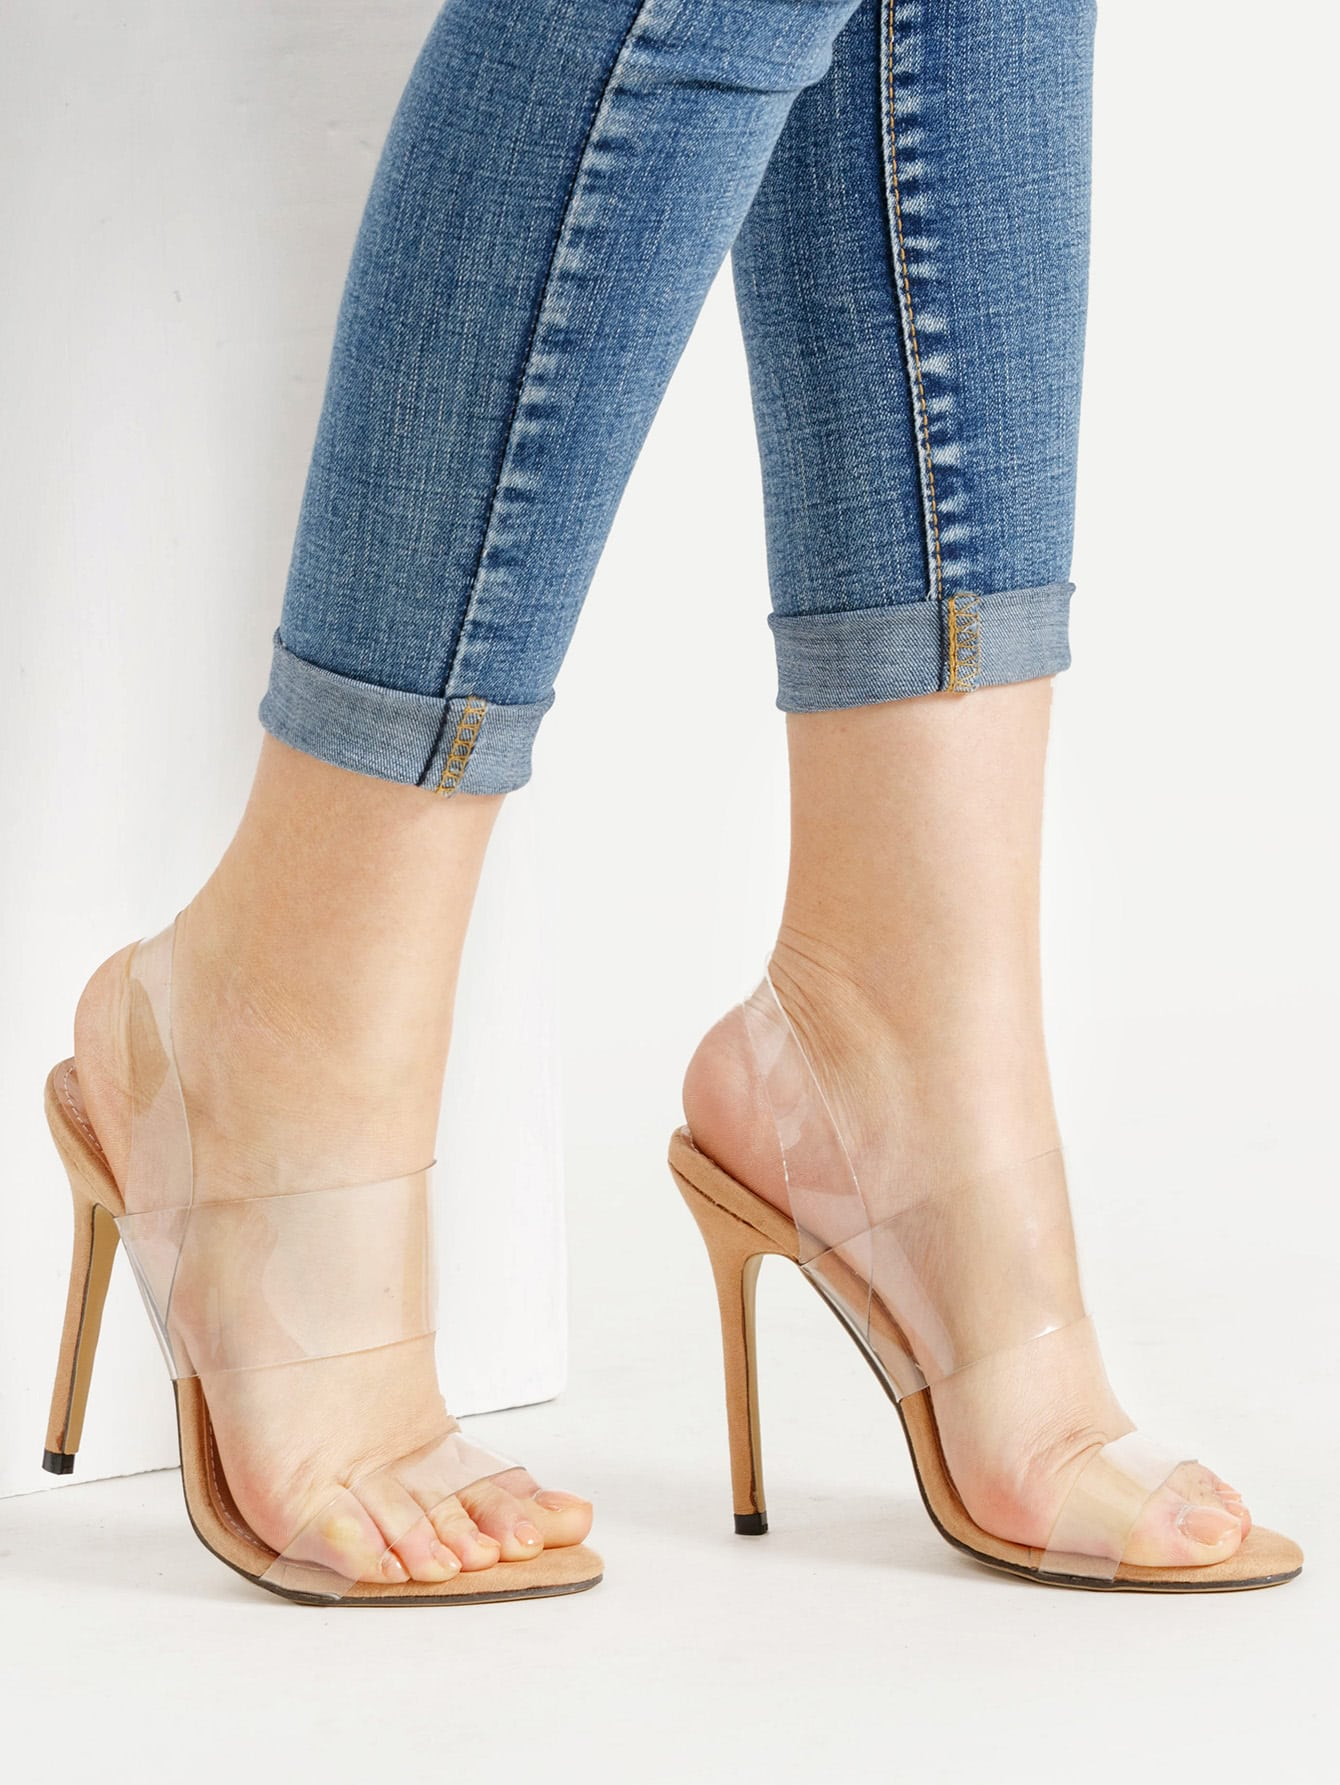 Clear Strap Stiletto Sandals shoes170418811